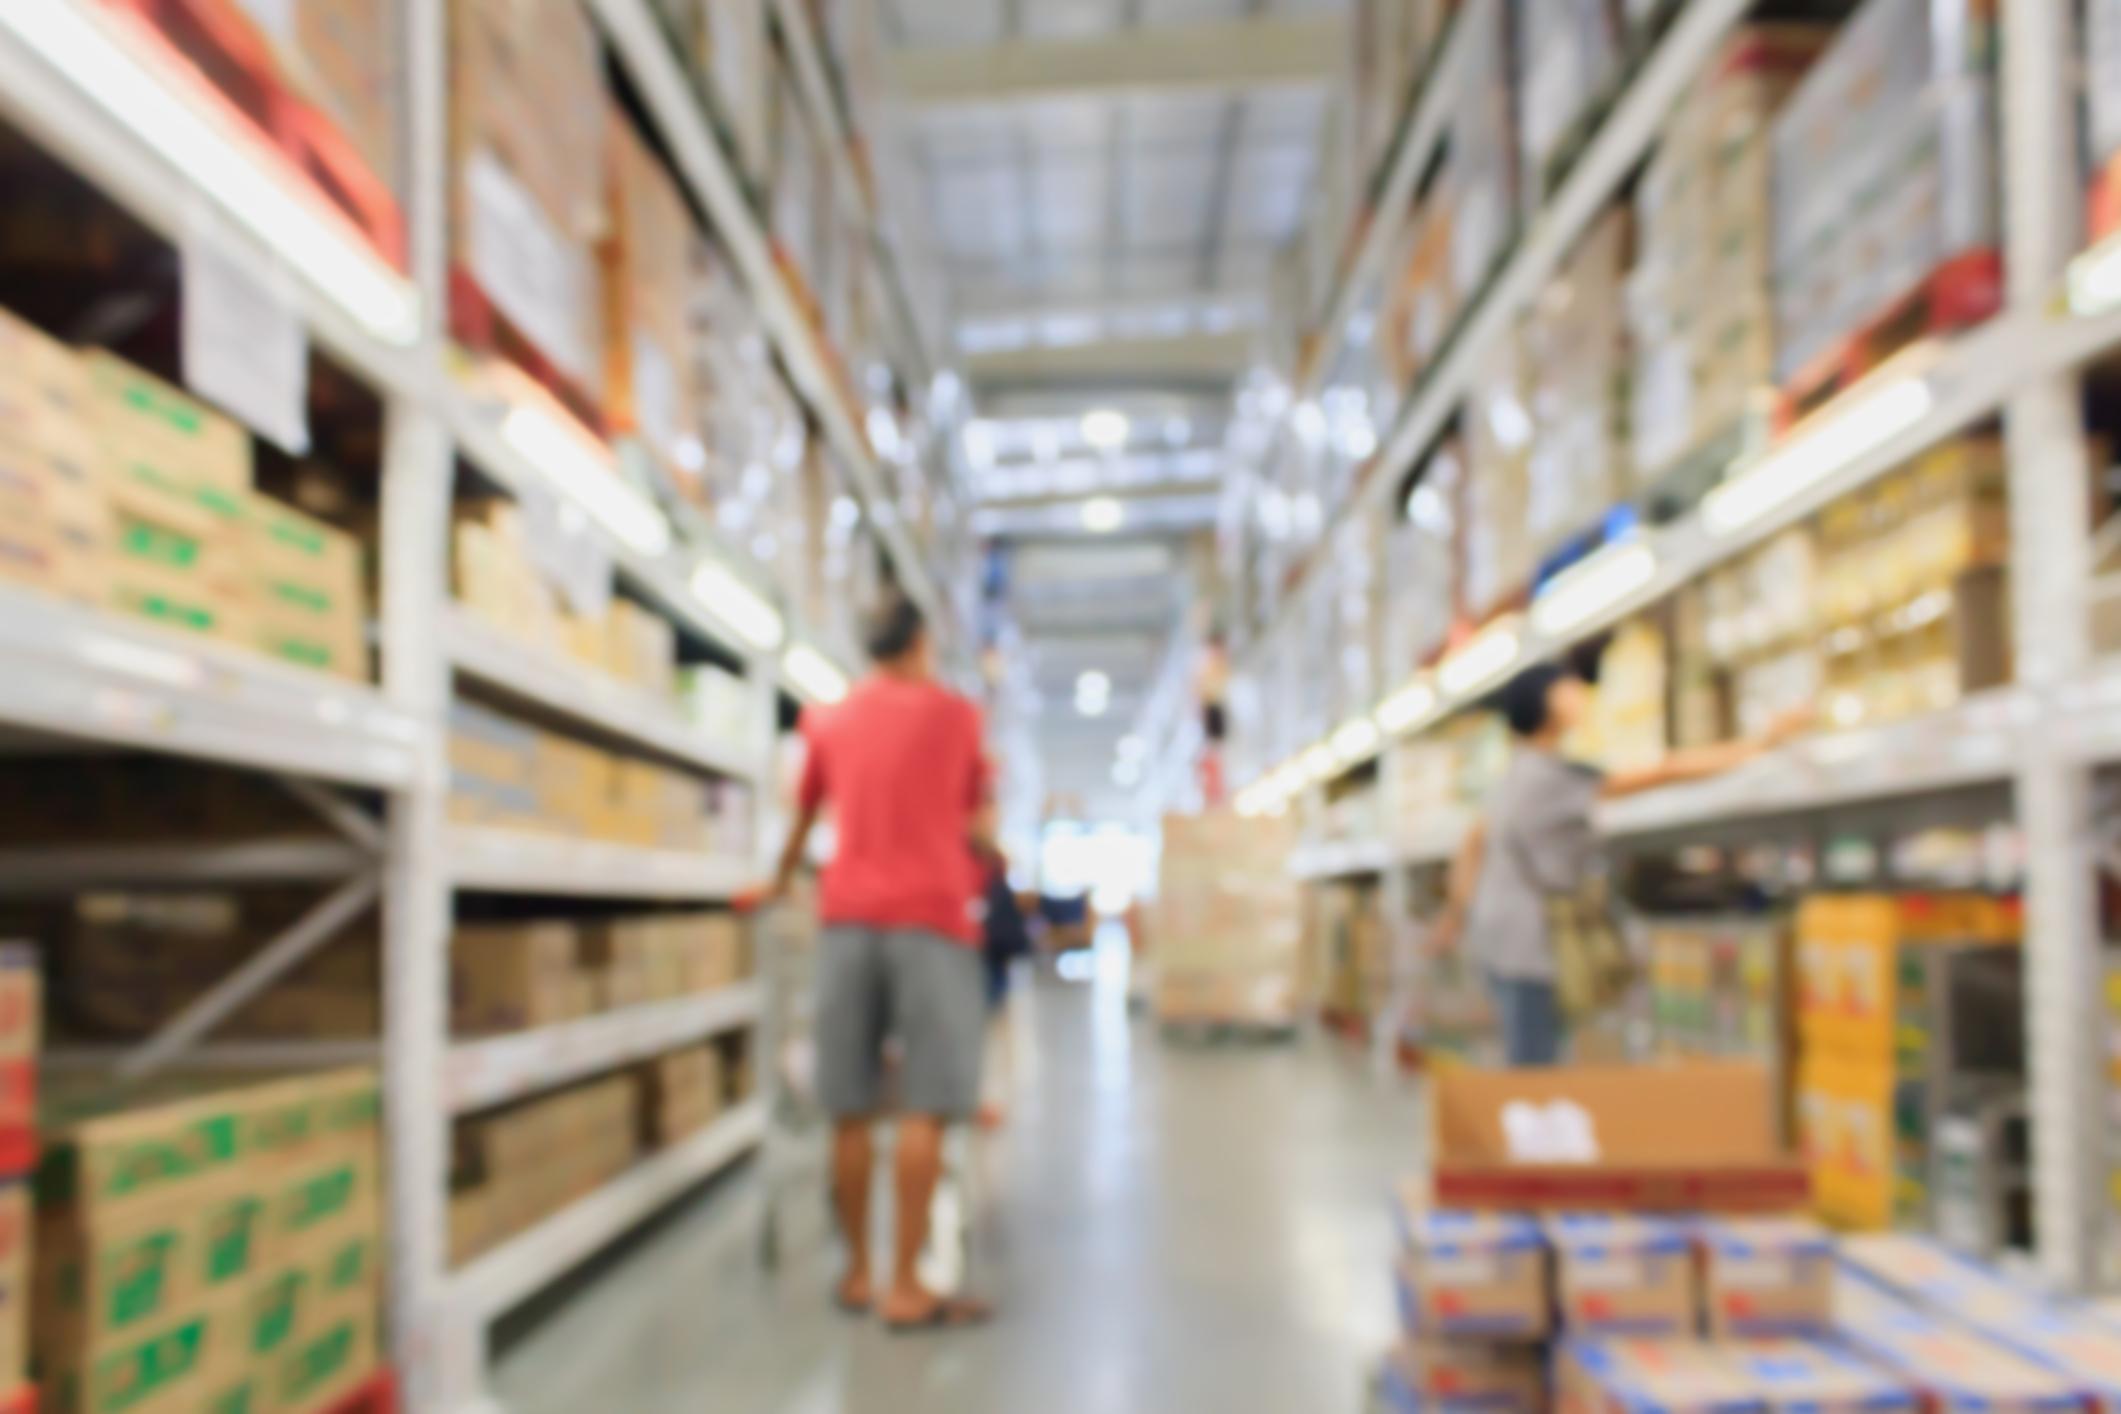 A man shopping in a warehouse